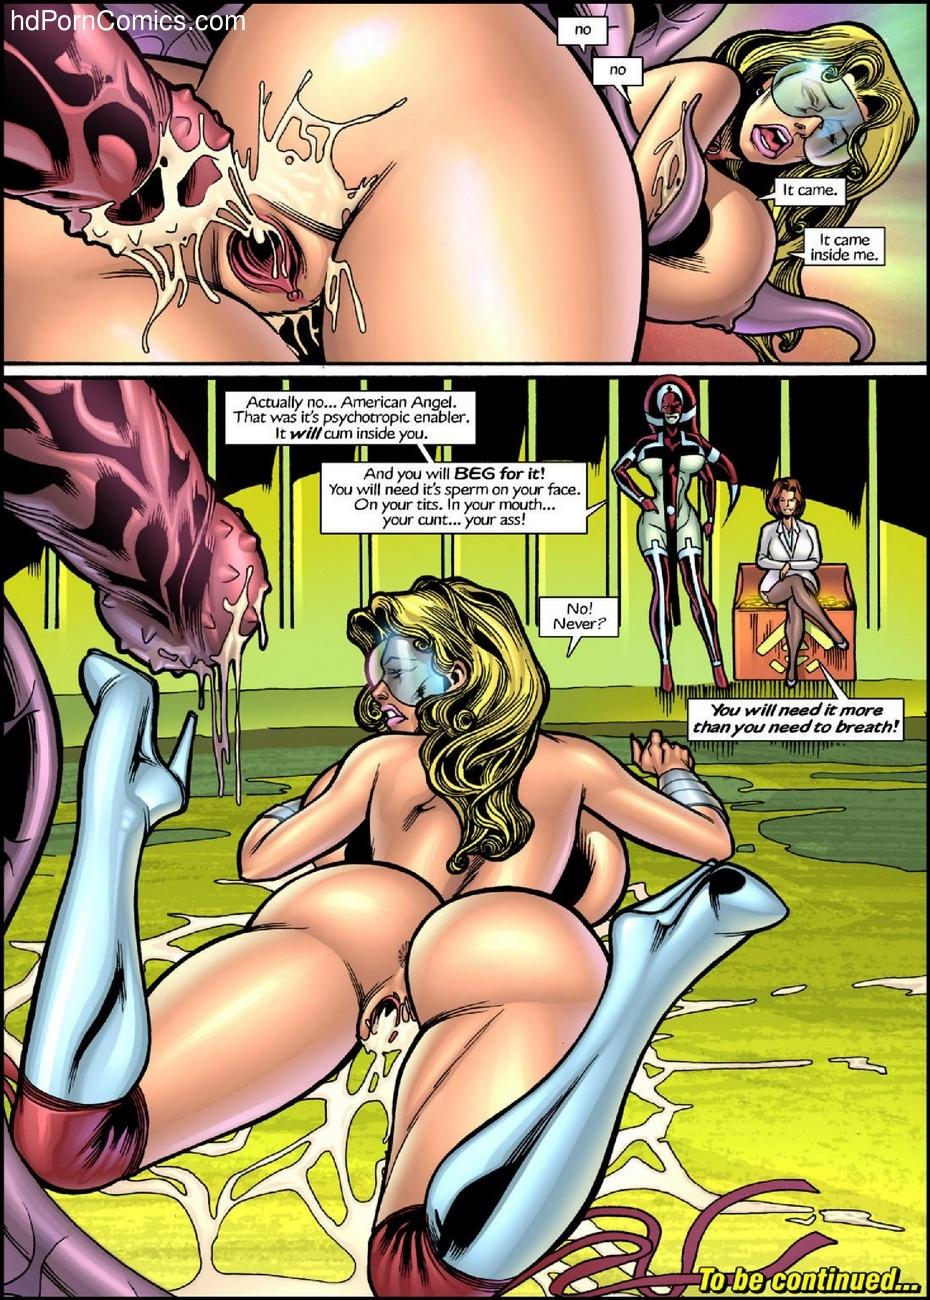 Freedom Stars - Cattle Call 1 19 free sex comic